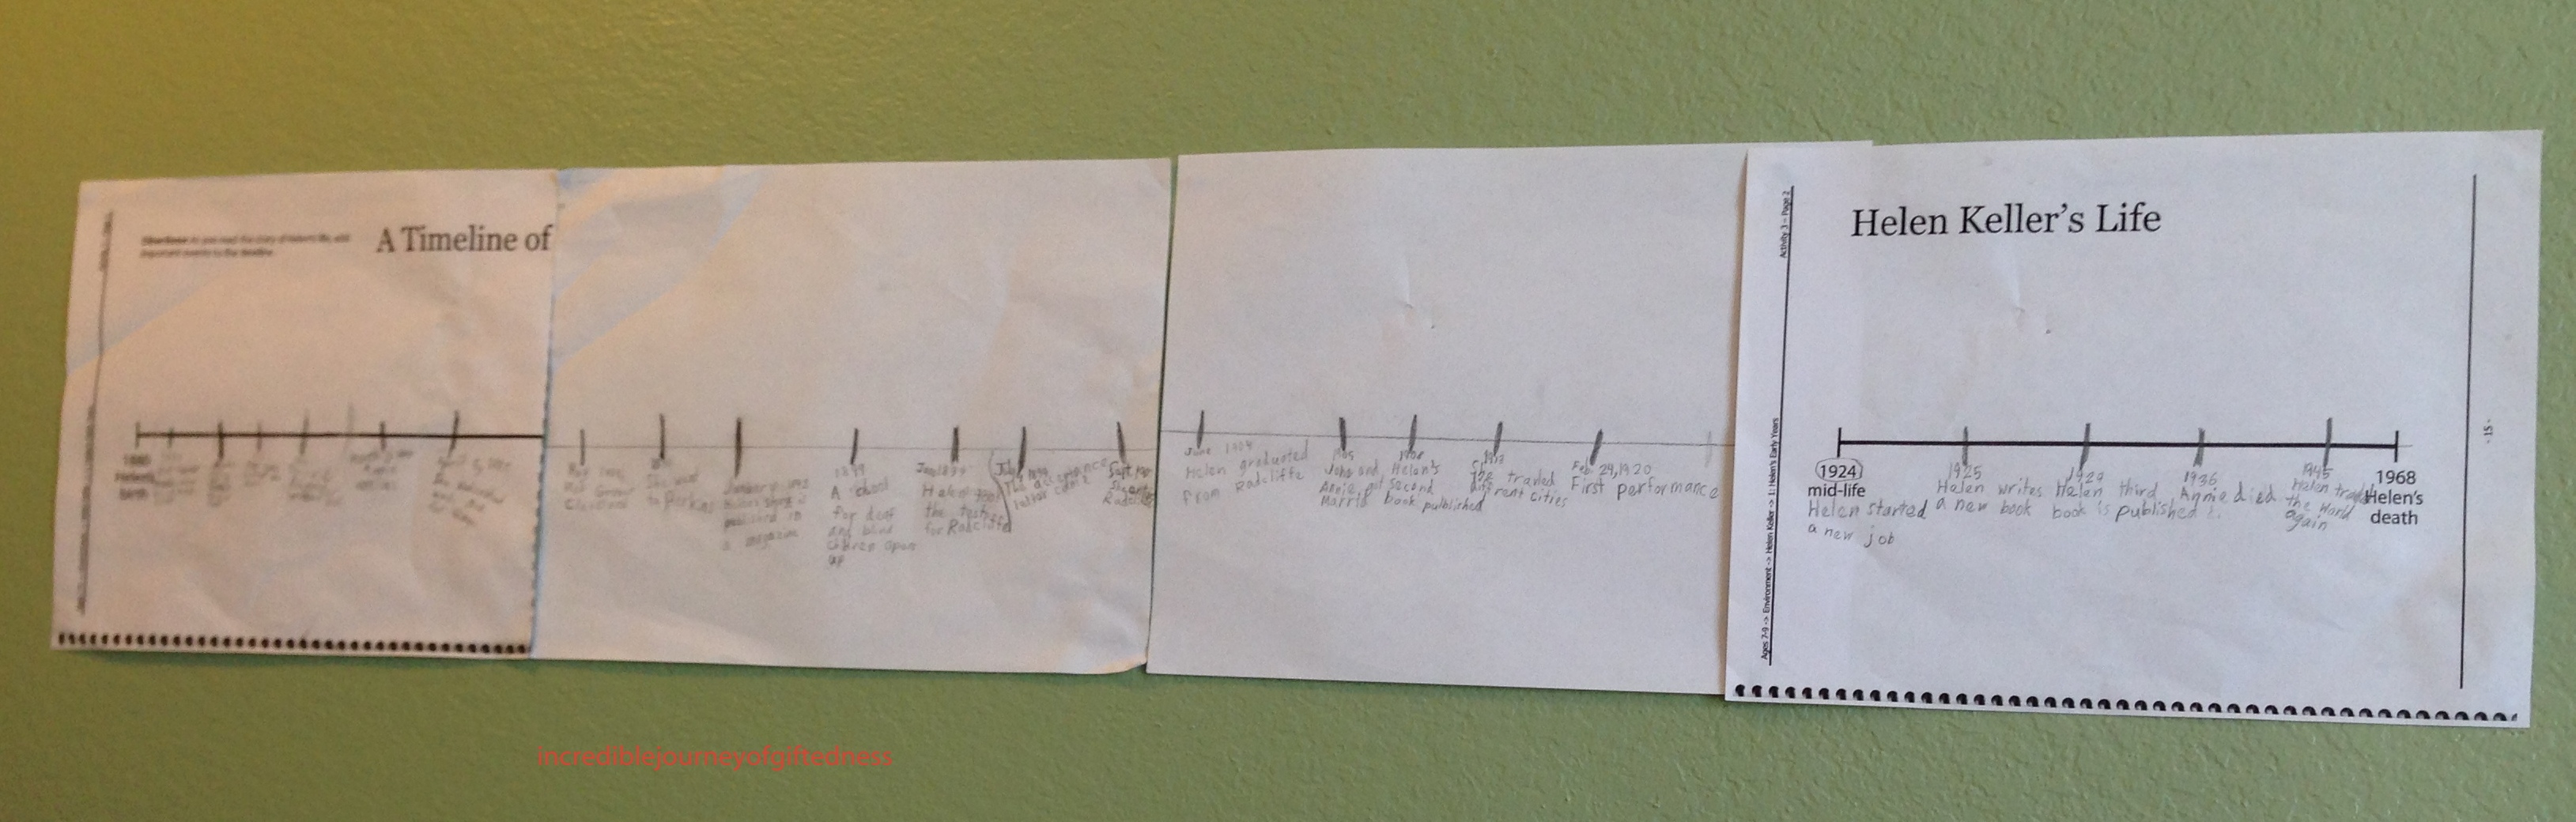 helen keller biography timeline our week of gifted ...